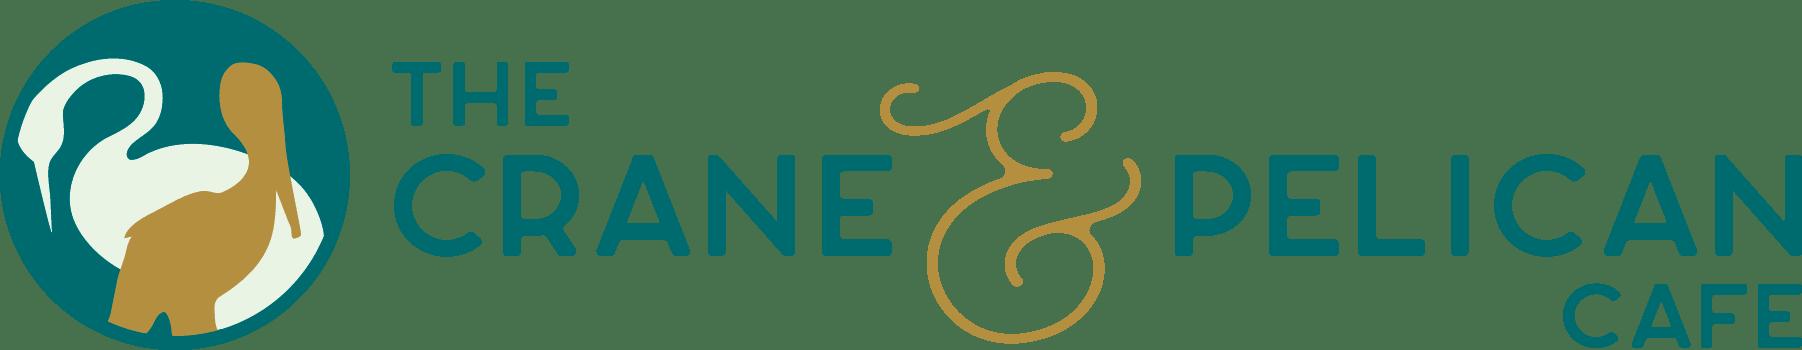 Crane & Pelican Cafe